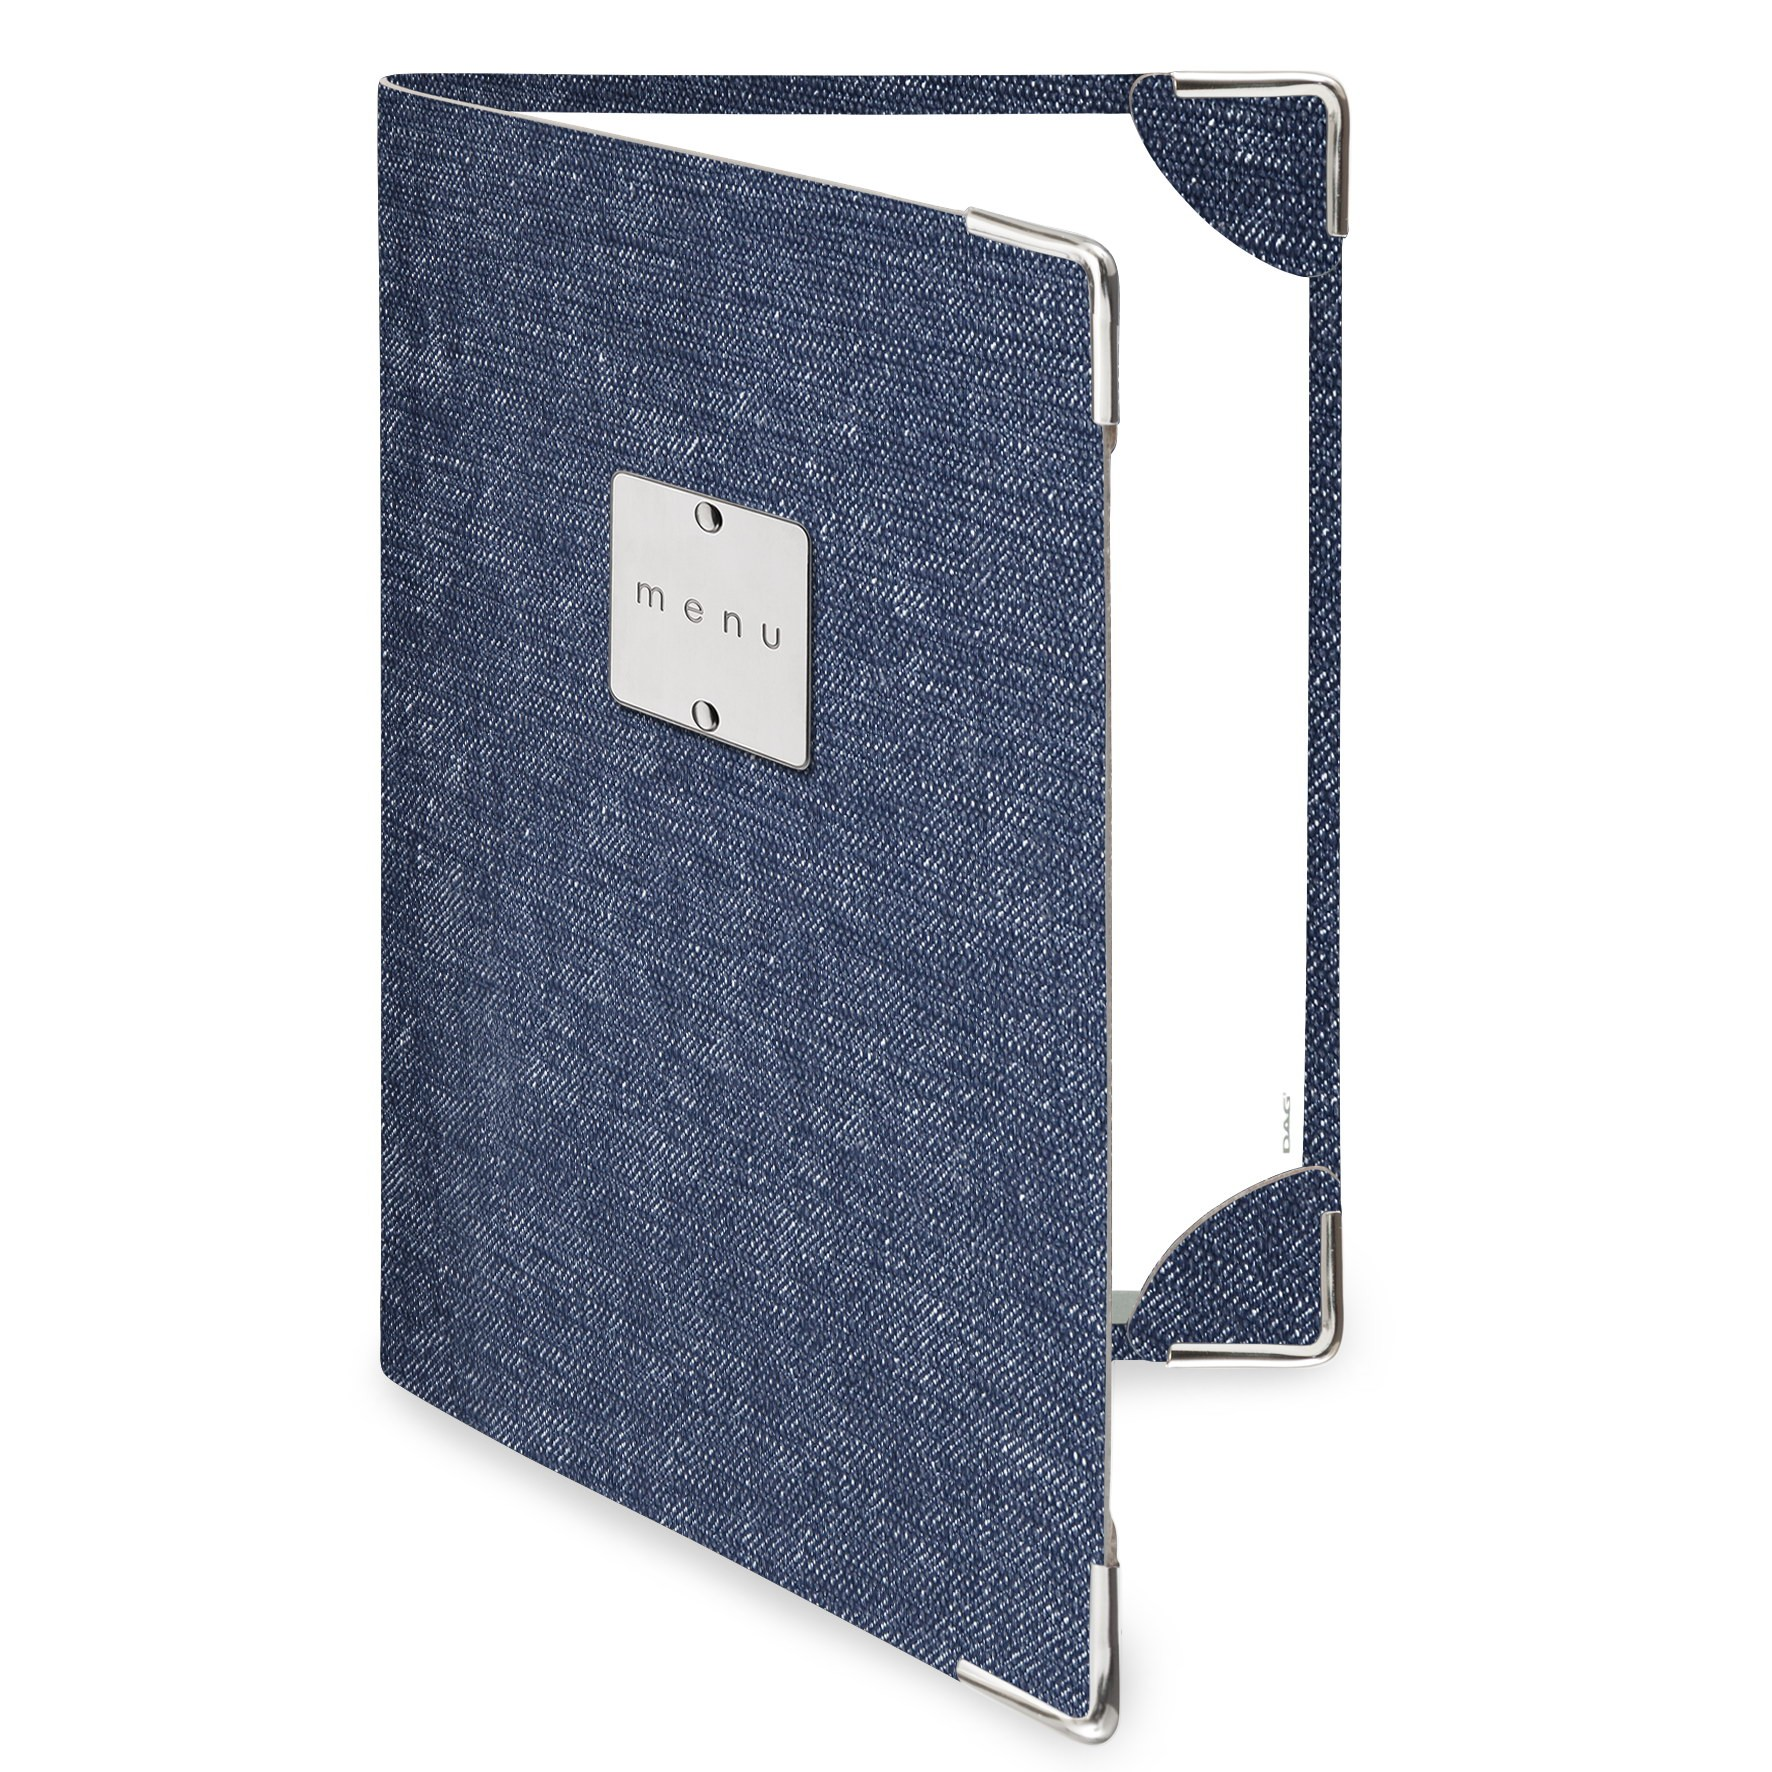 Protège menu 2 volets MenuMenu bleu aspect jean's